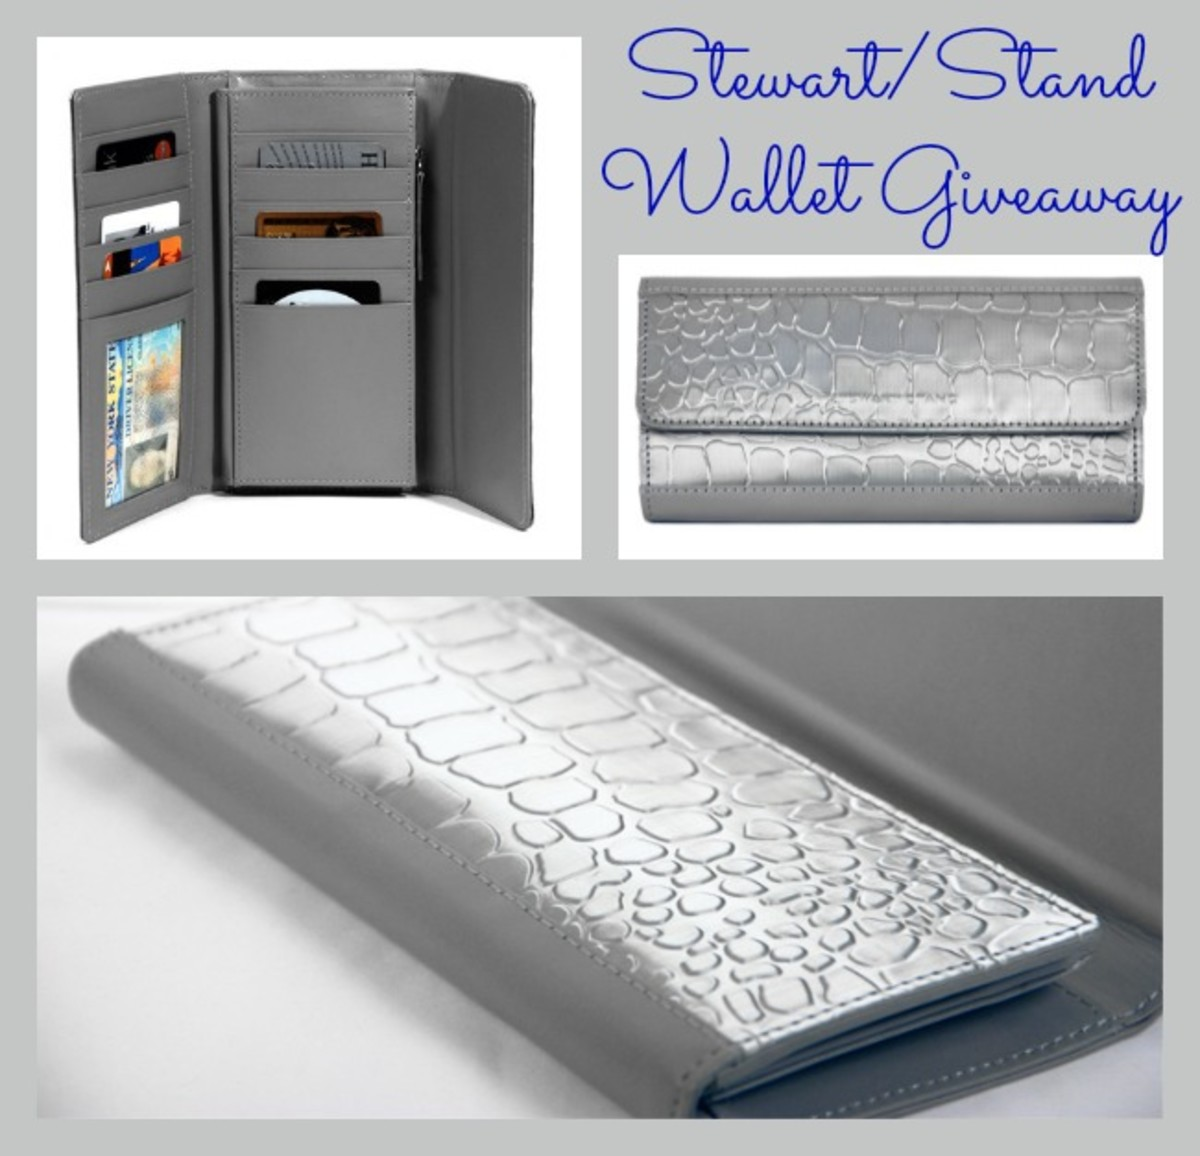 wallet_giveaway